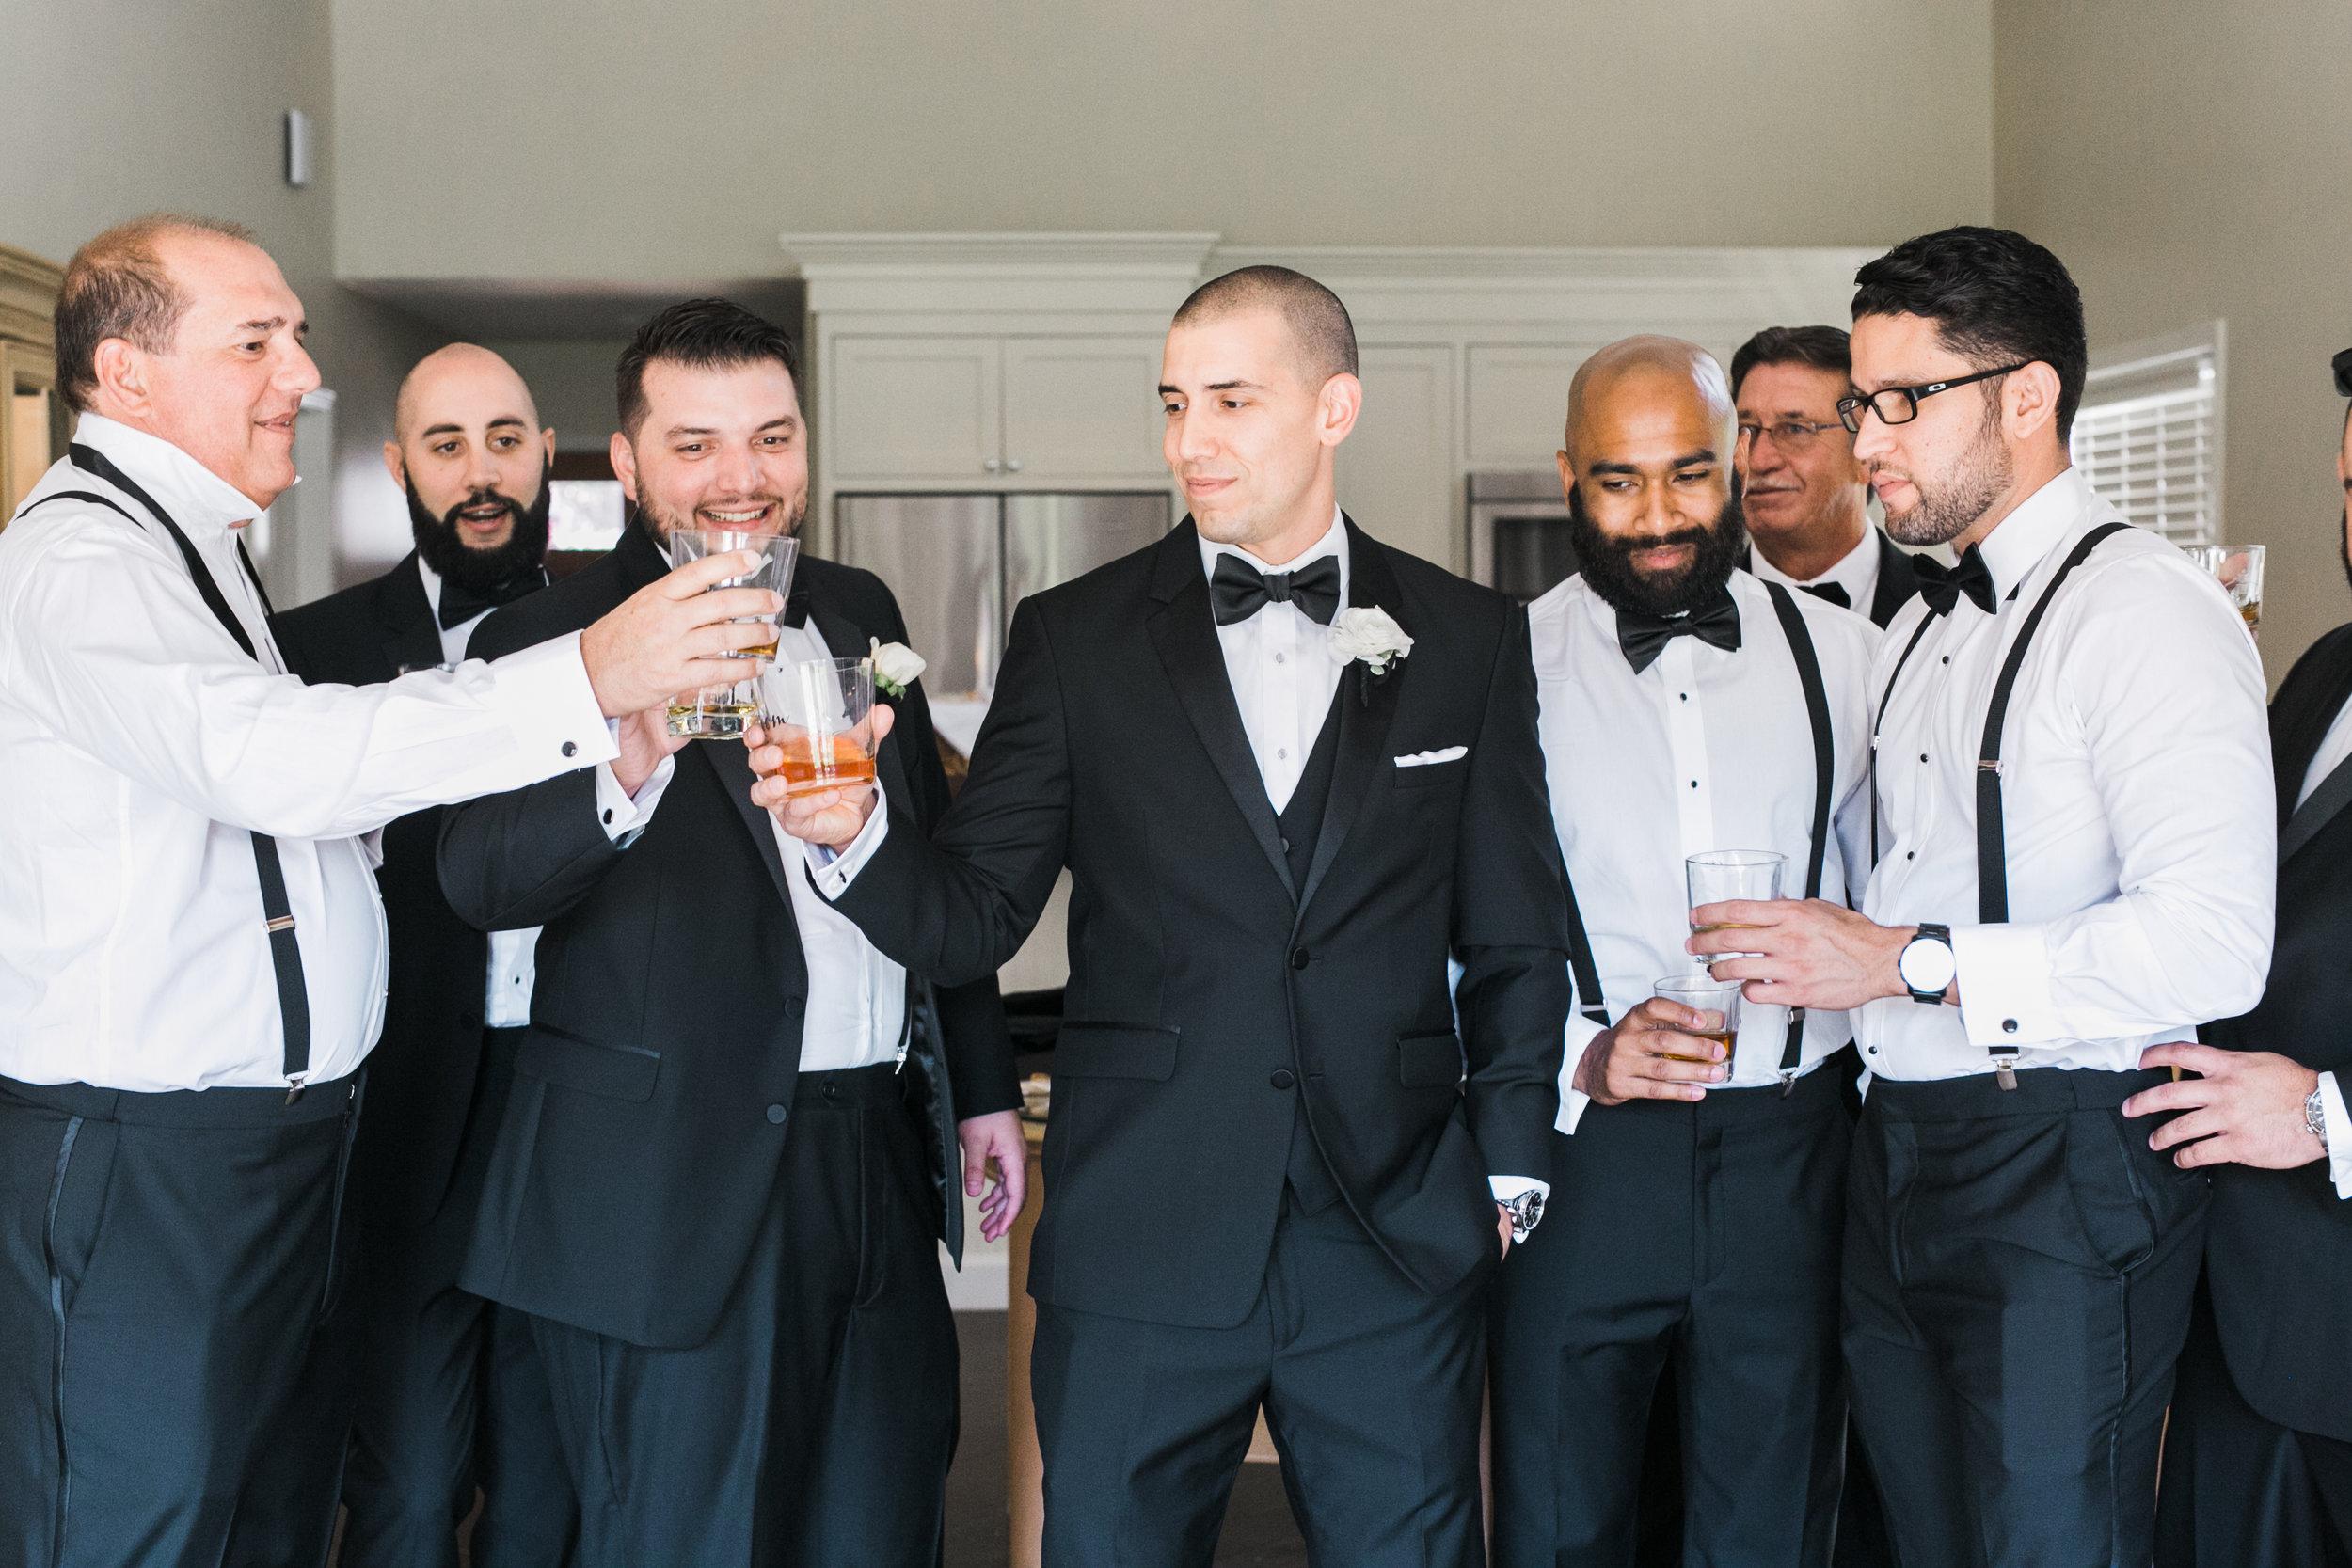 jenny-and-george-wedding-roque-events-meyerott-photography 245.jpg